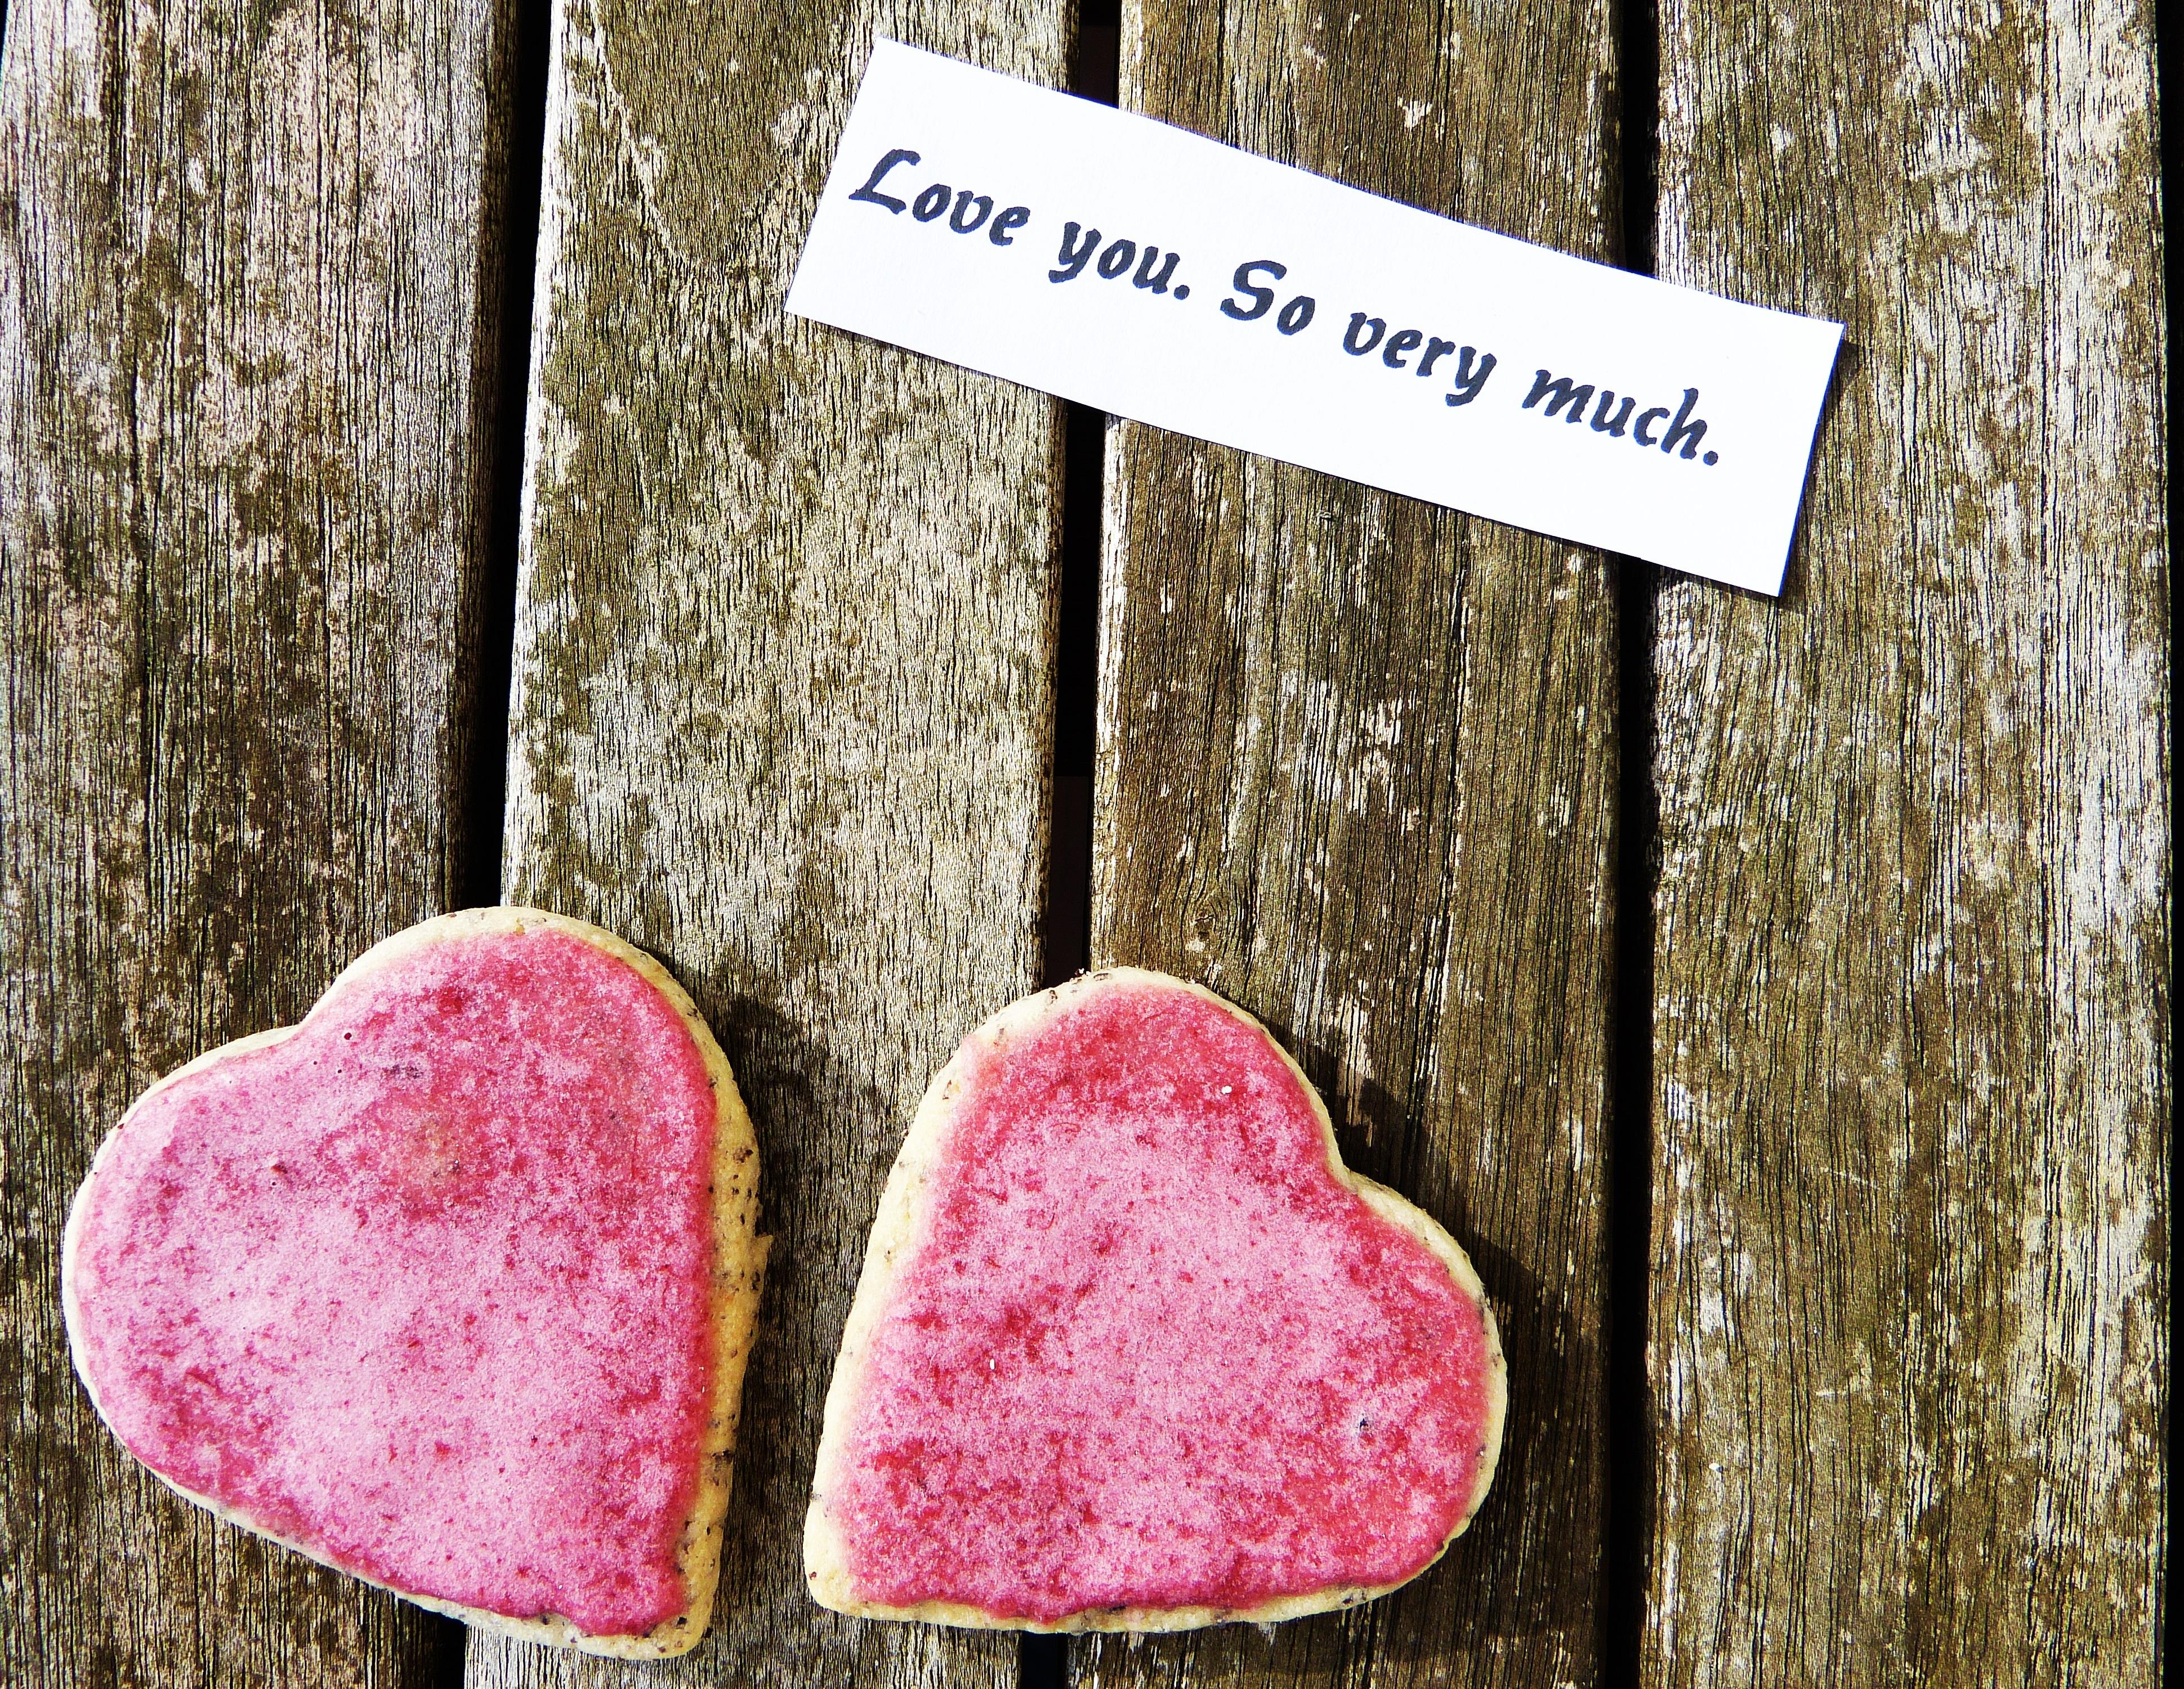 Kostenlose Foto Holz Blume Liebe Herz Lebensmittel Fruhling